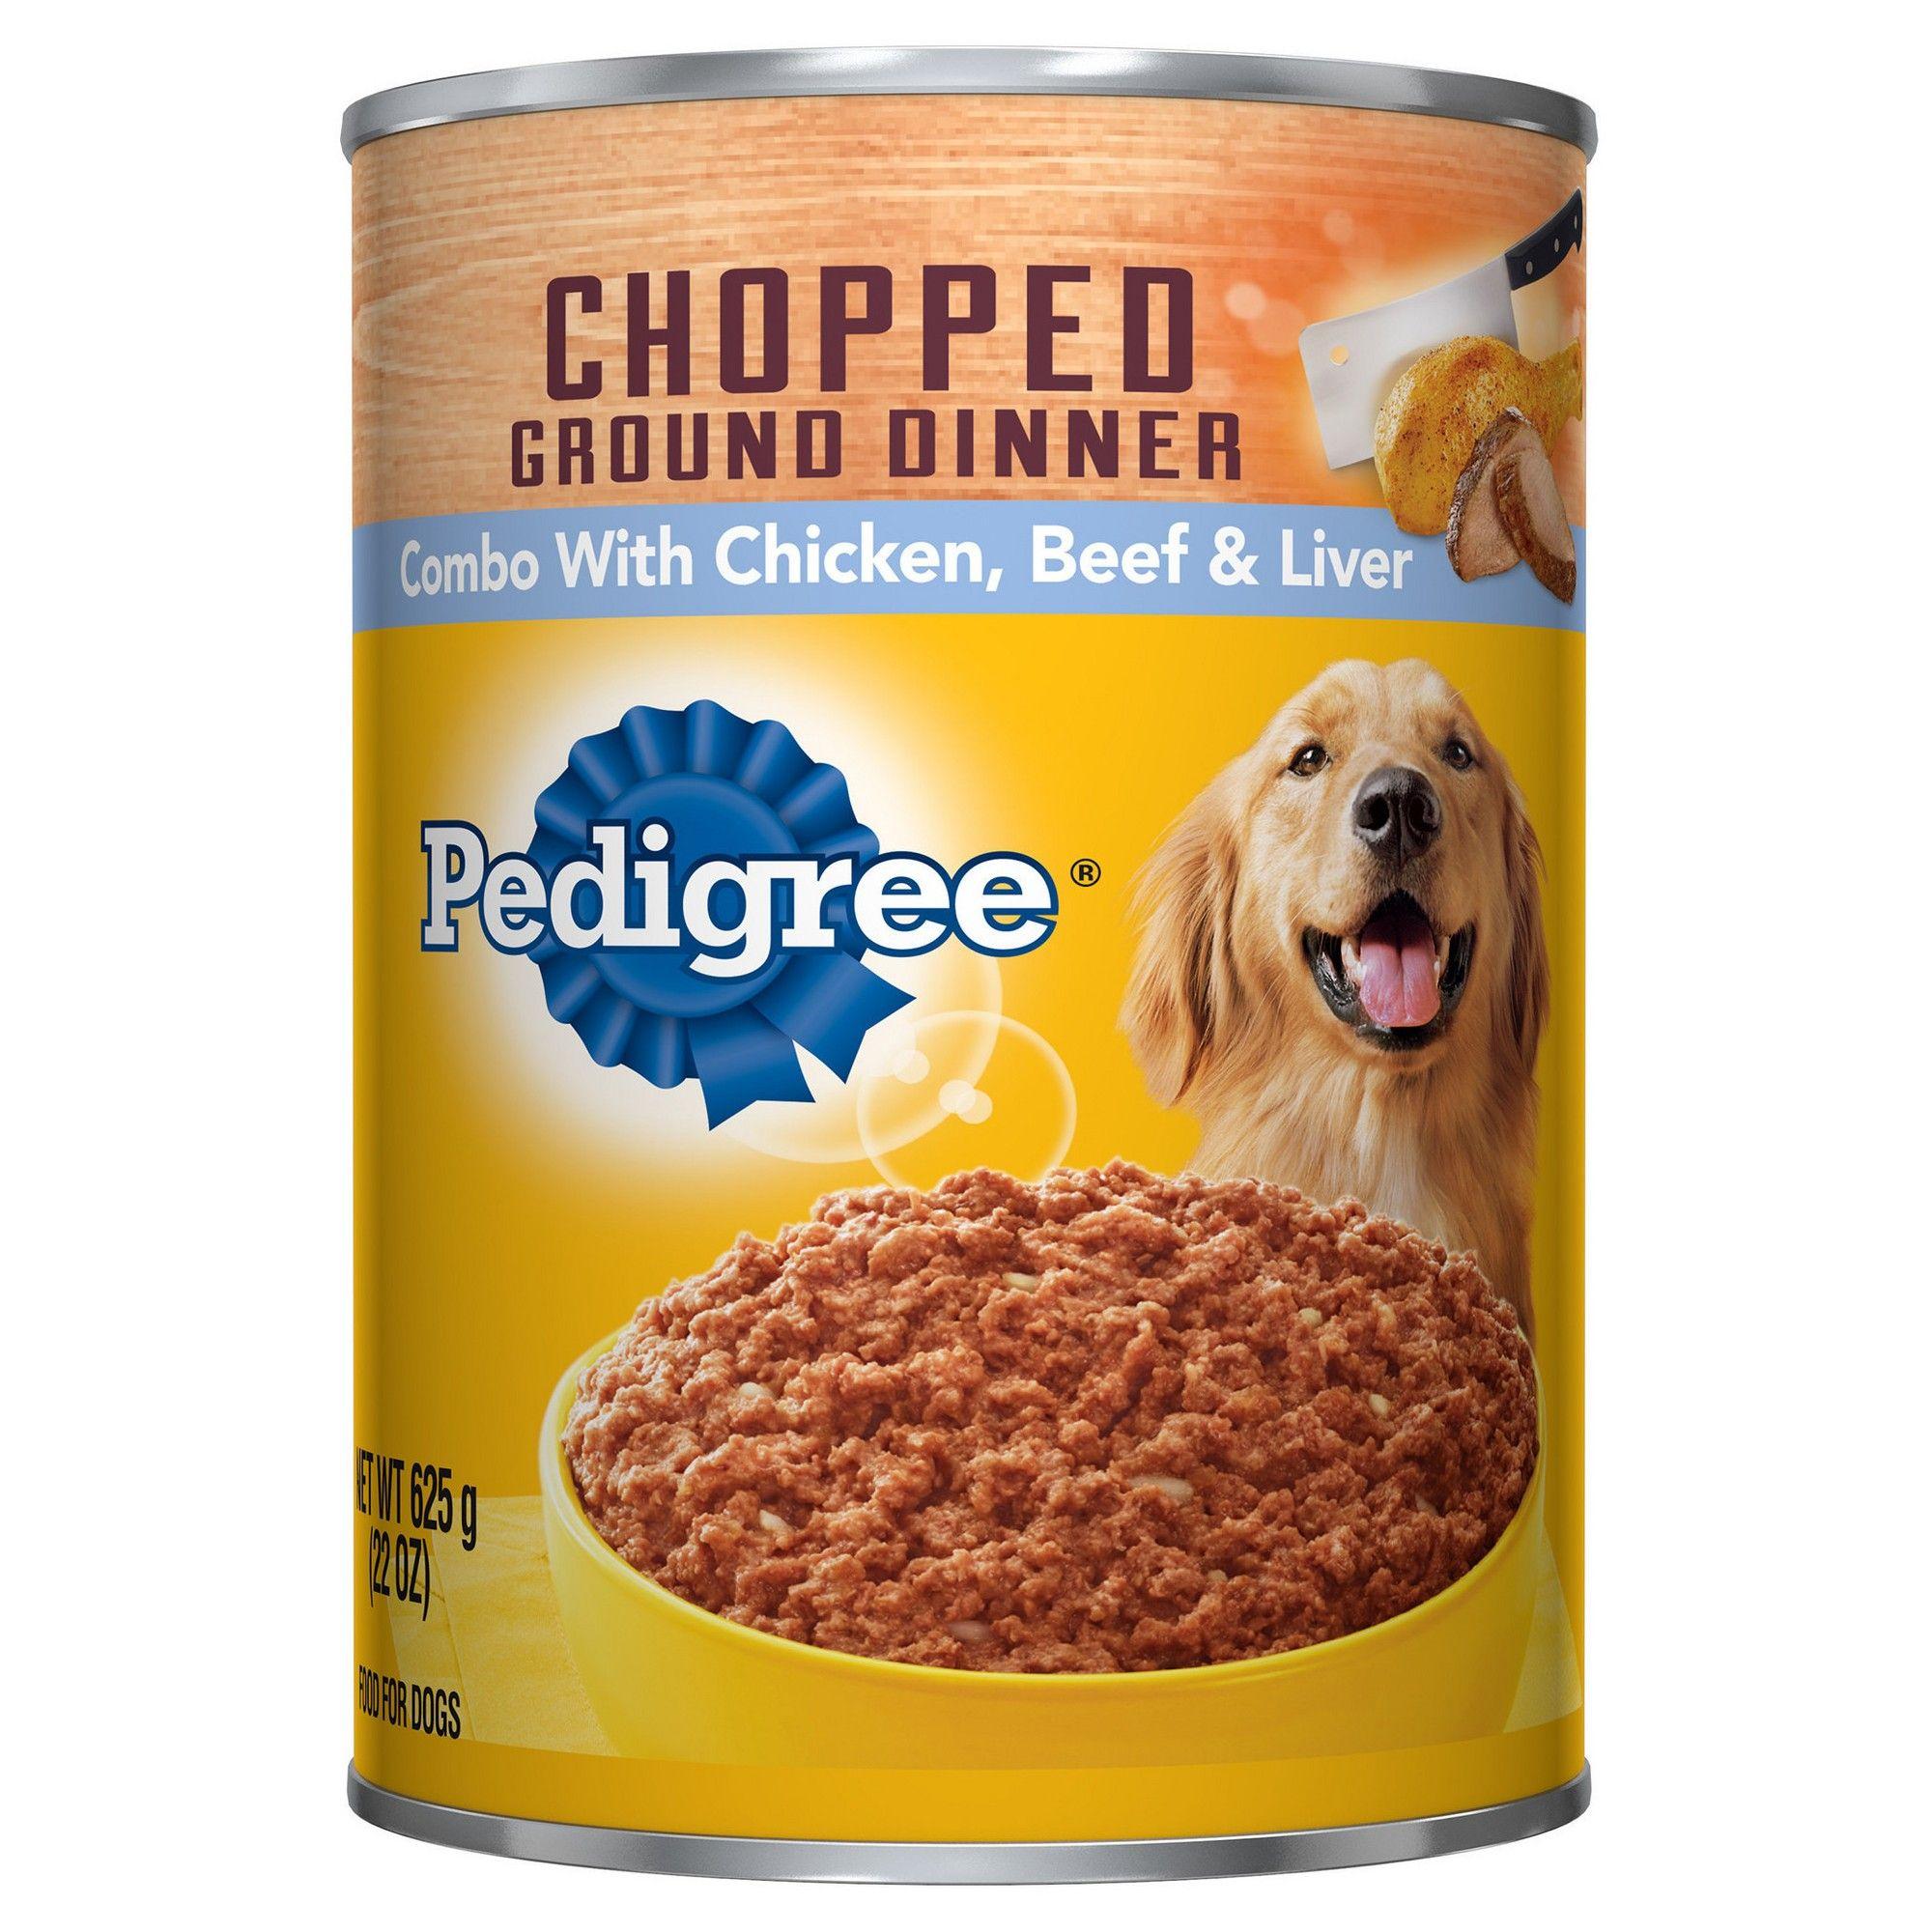 Pedigree Chopped Chicken Beef & Liver Meaty Ground Dinner